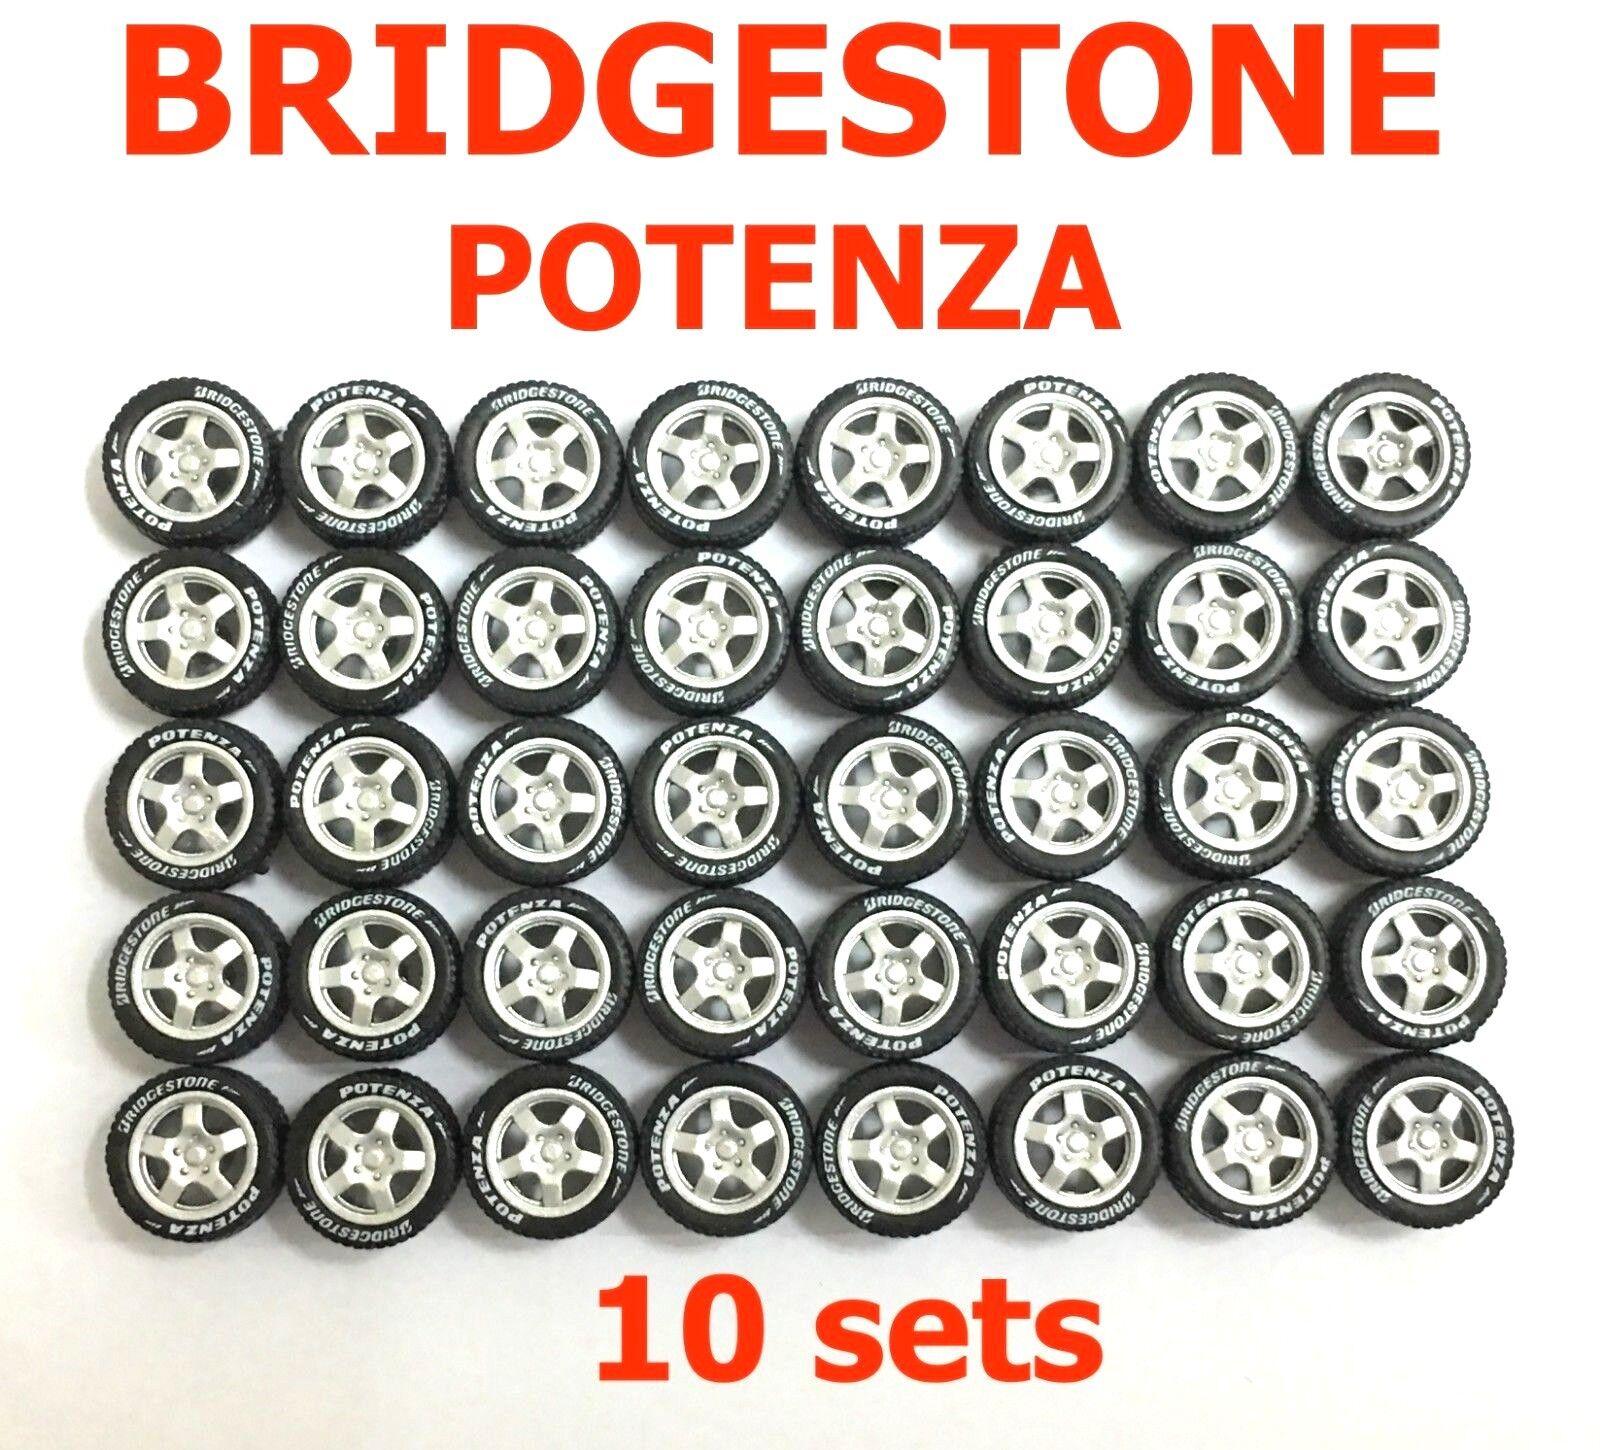 1 64 rubber tire - 5 spoke silver rim fit Hot Wheels Majorette diecast - R011-10